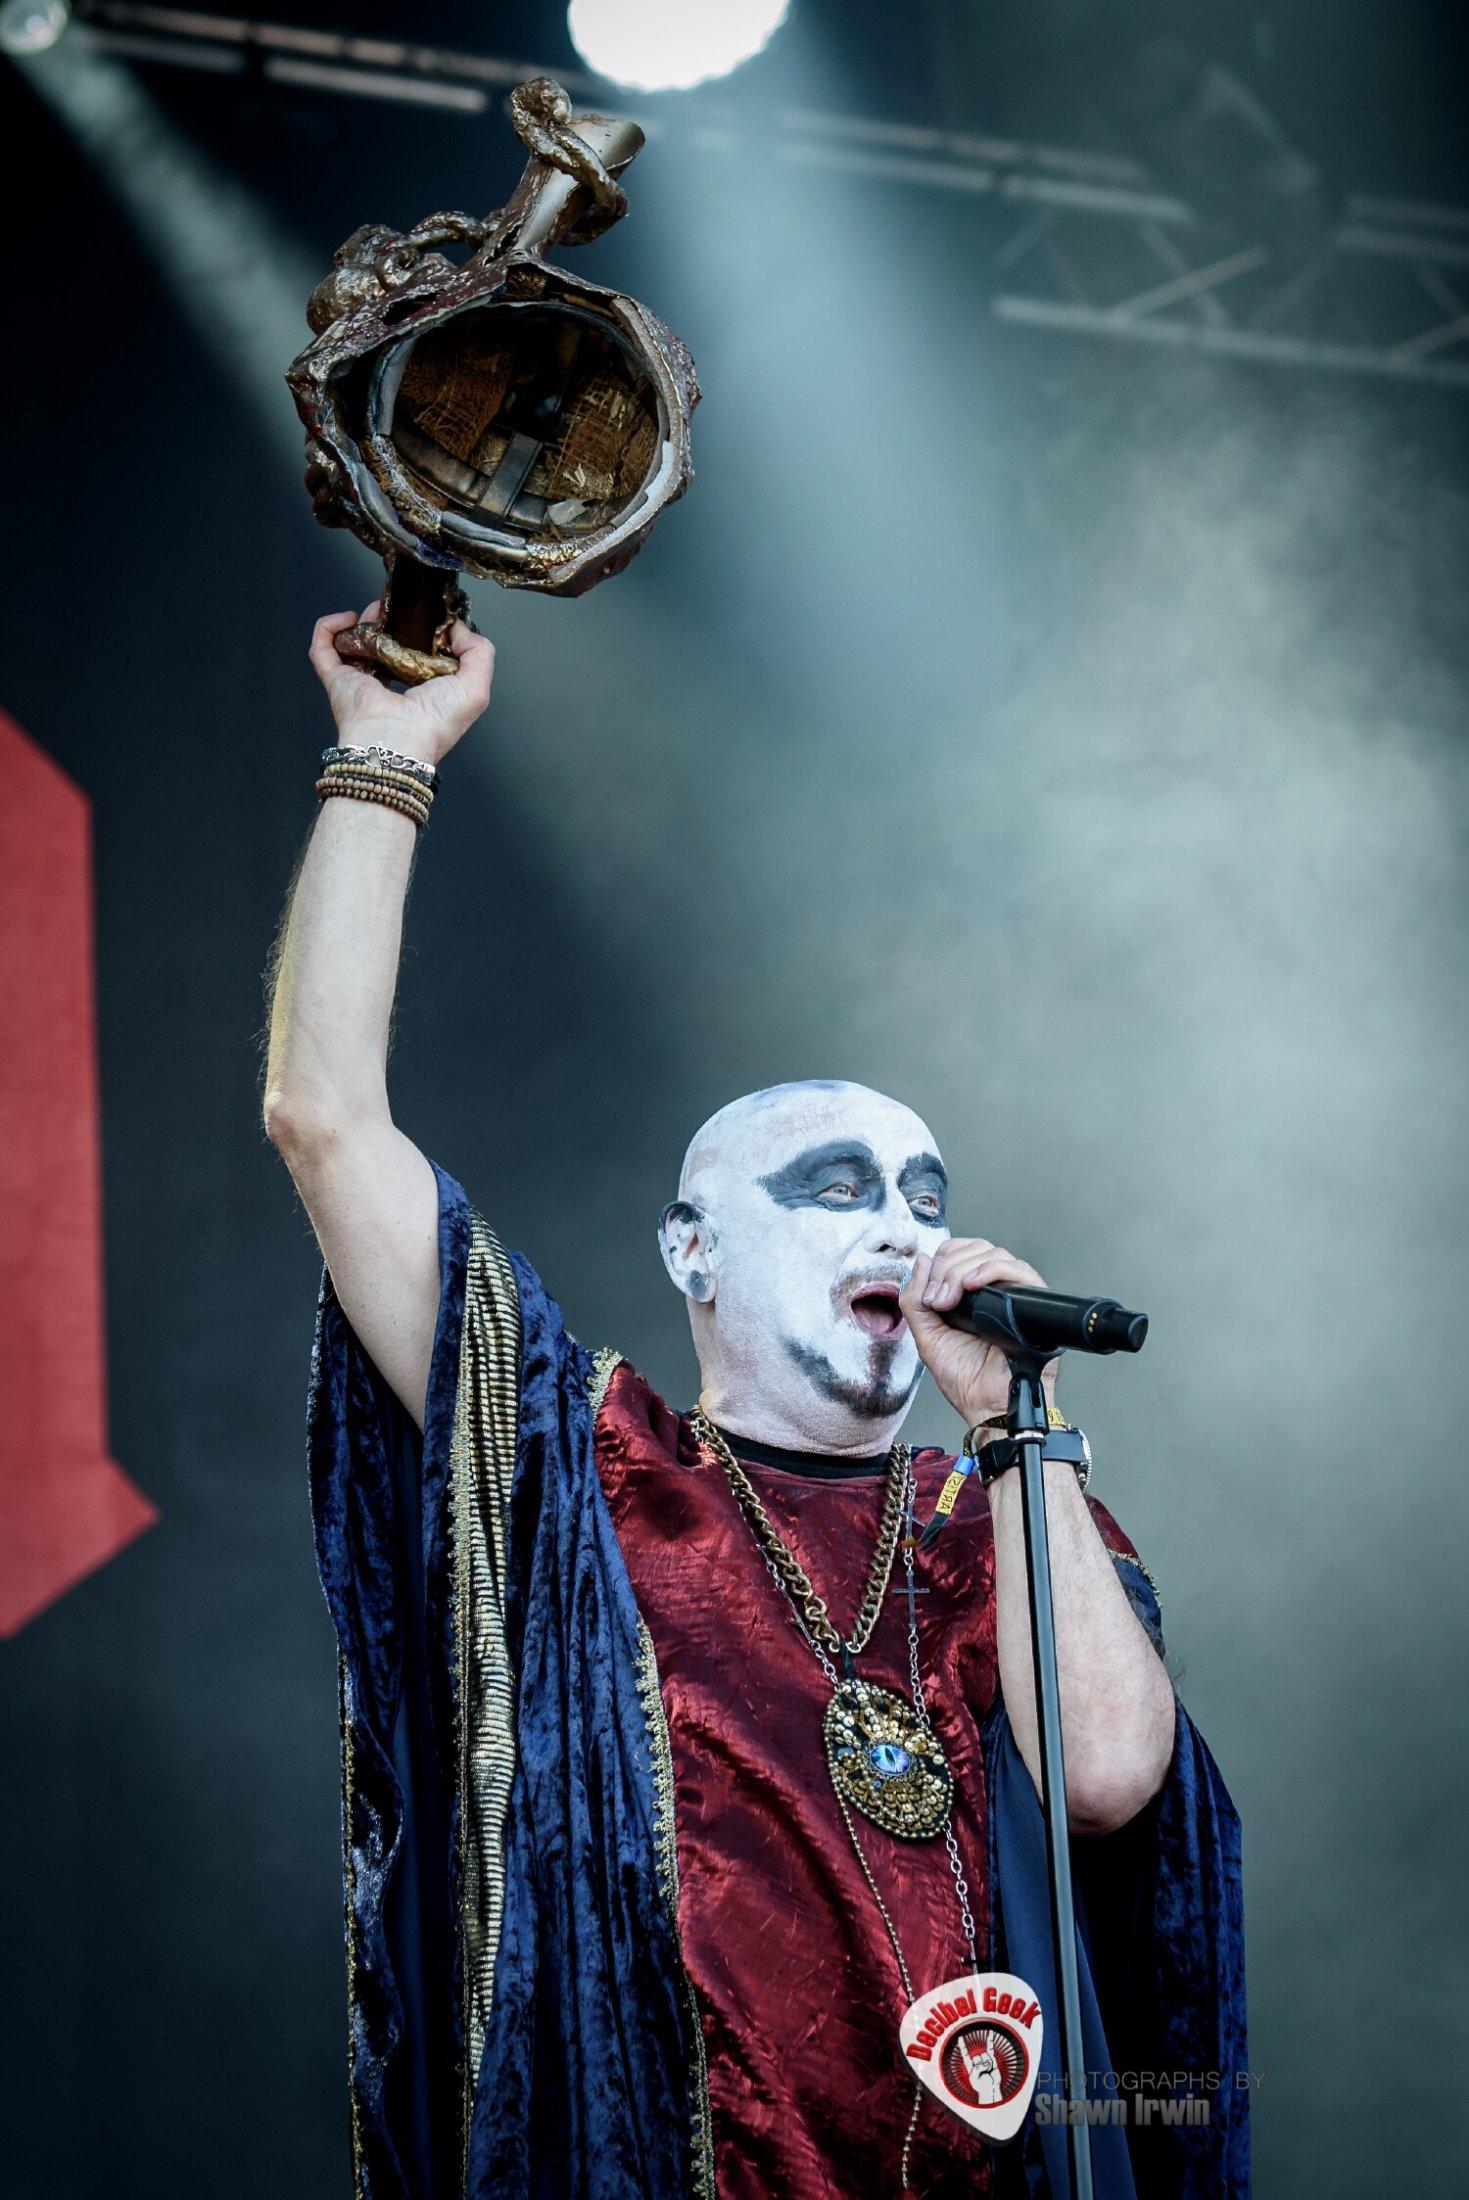 Demon #16-Sweden Rock 2019-Shawn Irwin